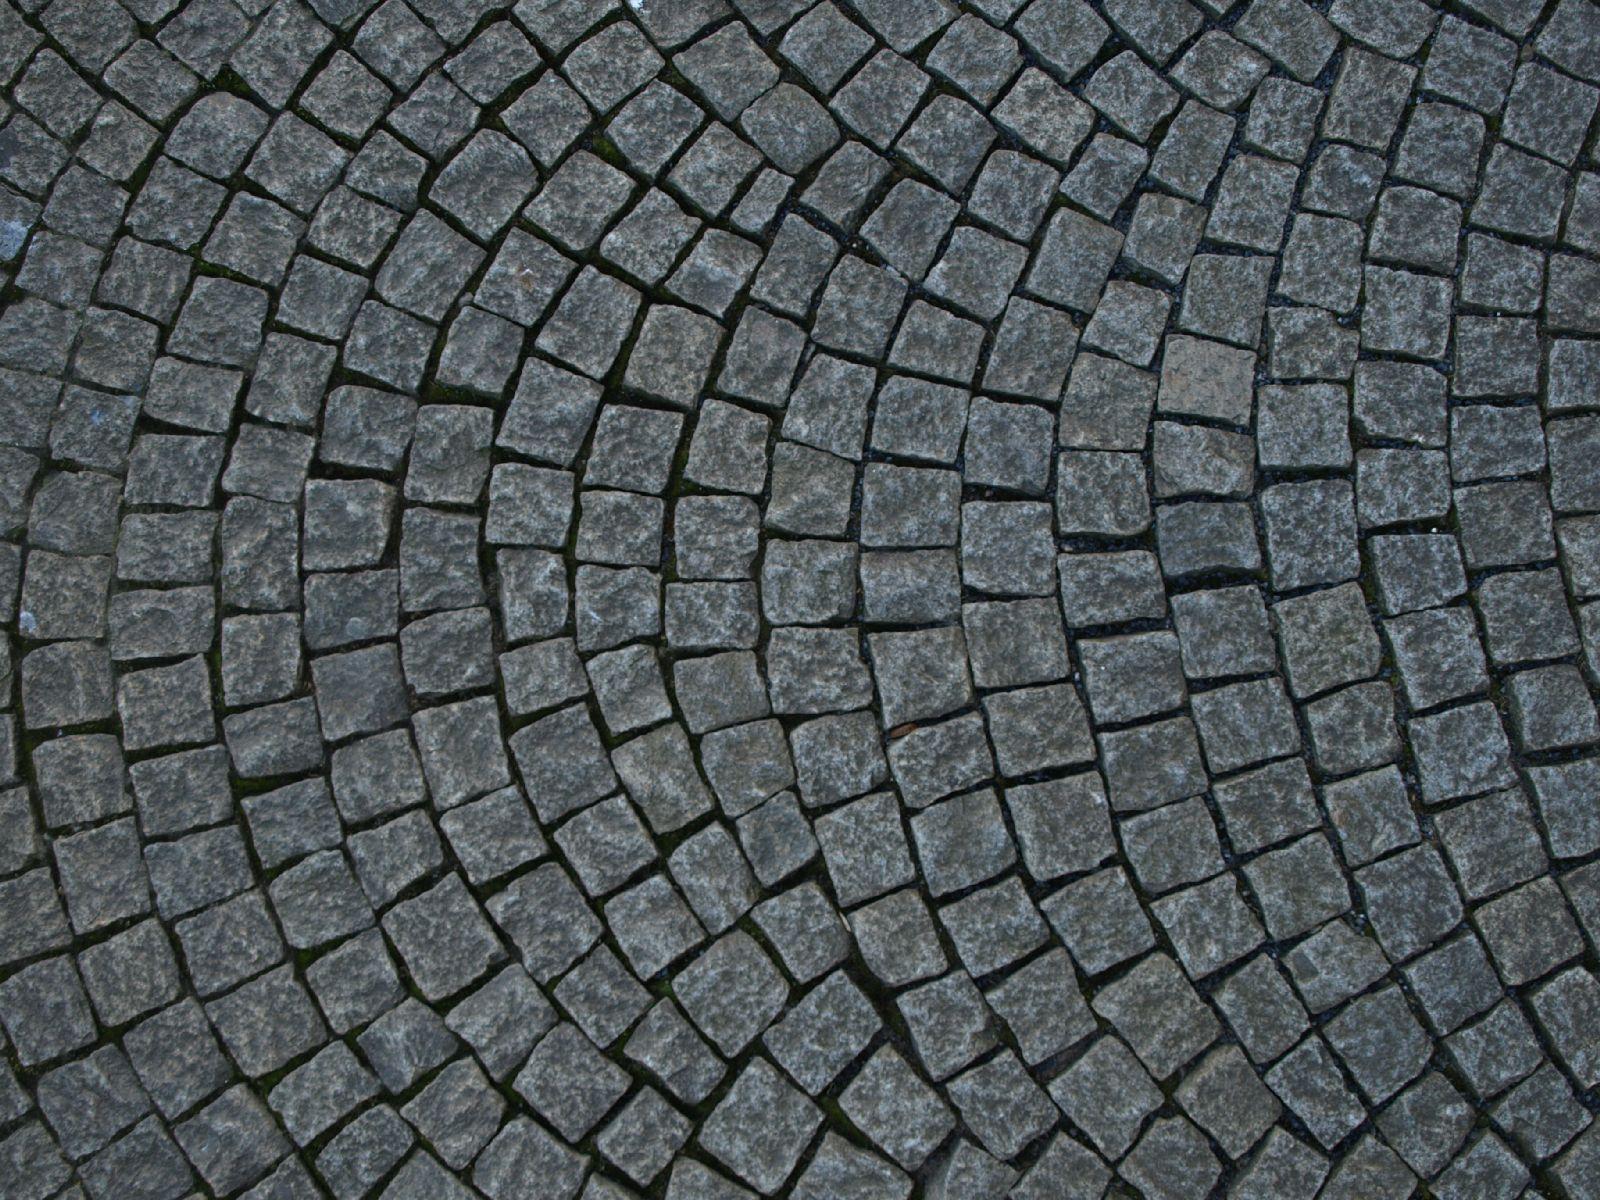 Ground-Urban_Texture_A_PC278575